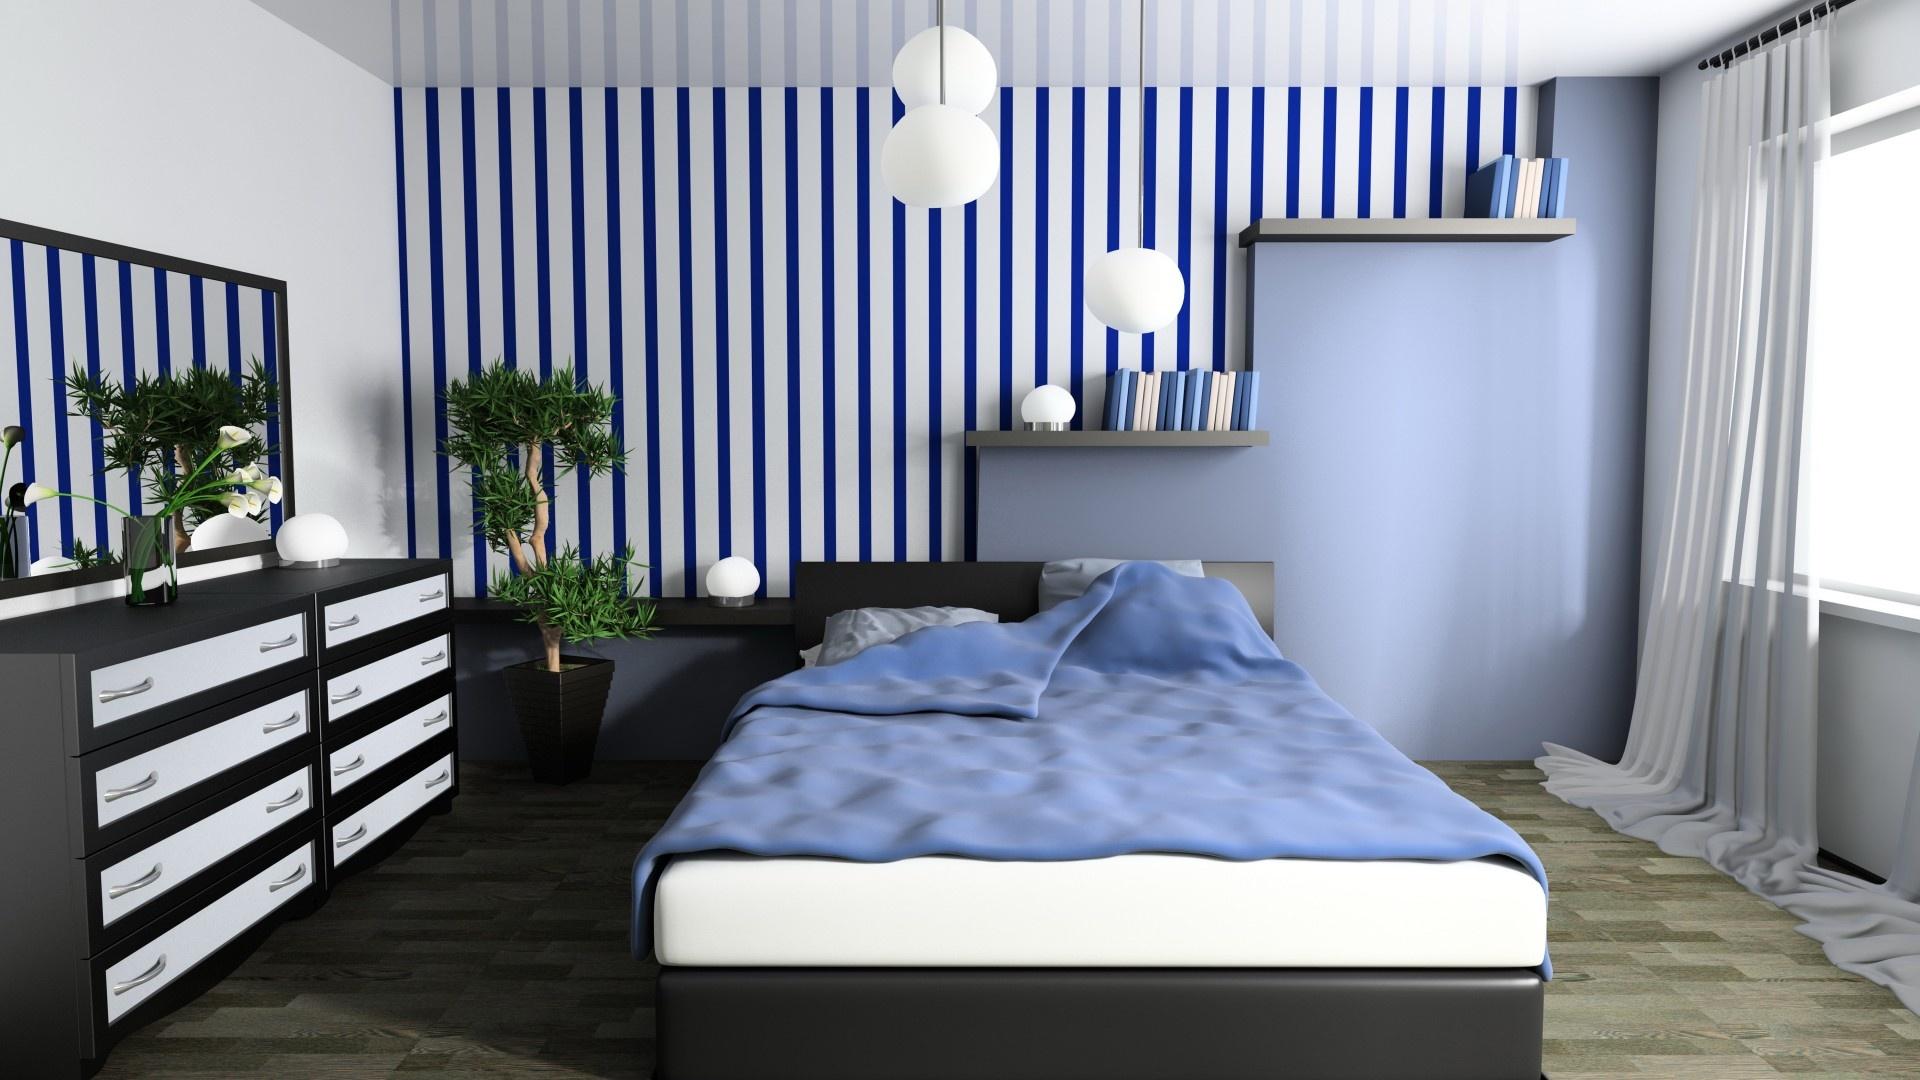 Blue Bedroom Interior Design Hd Wallpaper New Hd Wallpapers